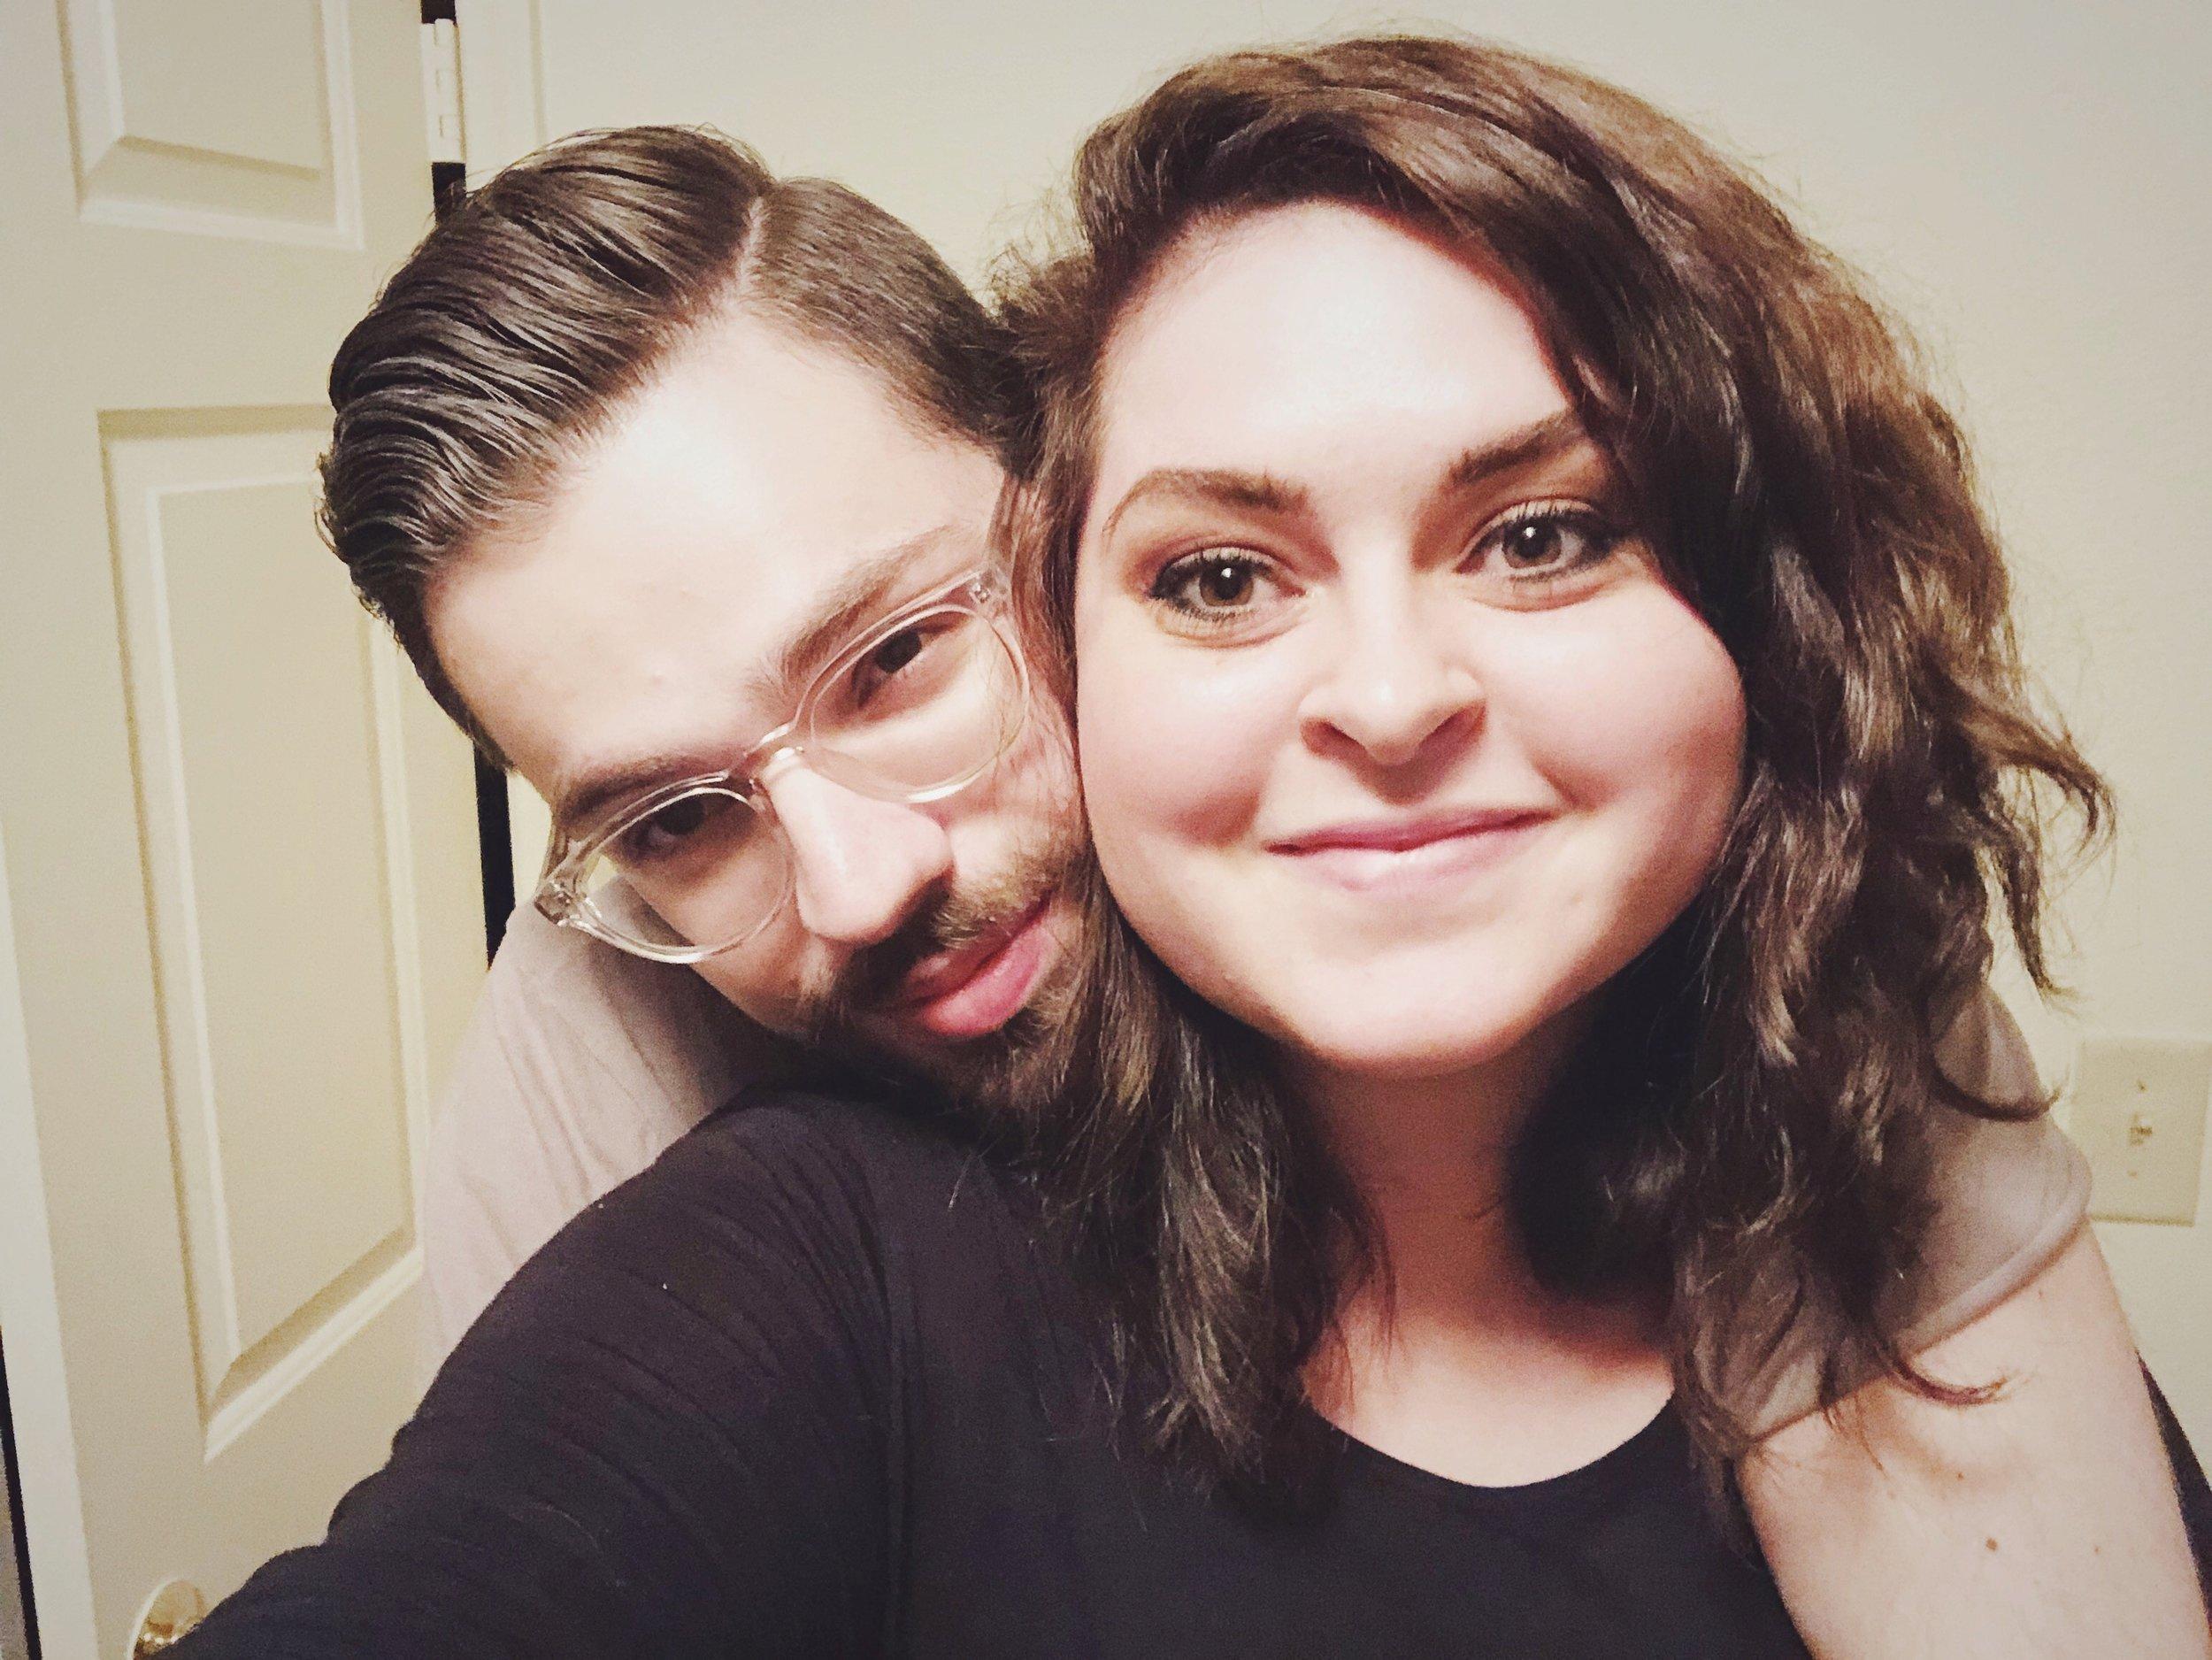 - Bre and her husband, Sam